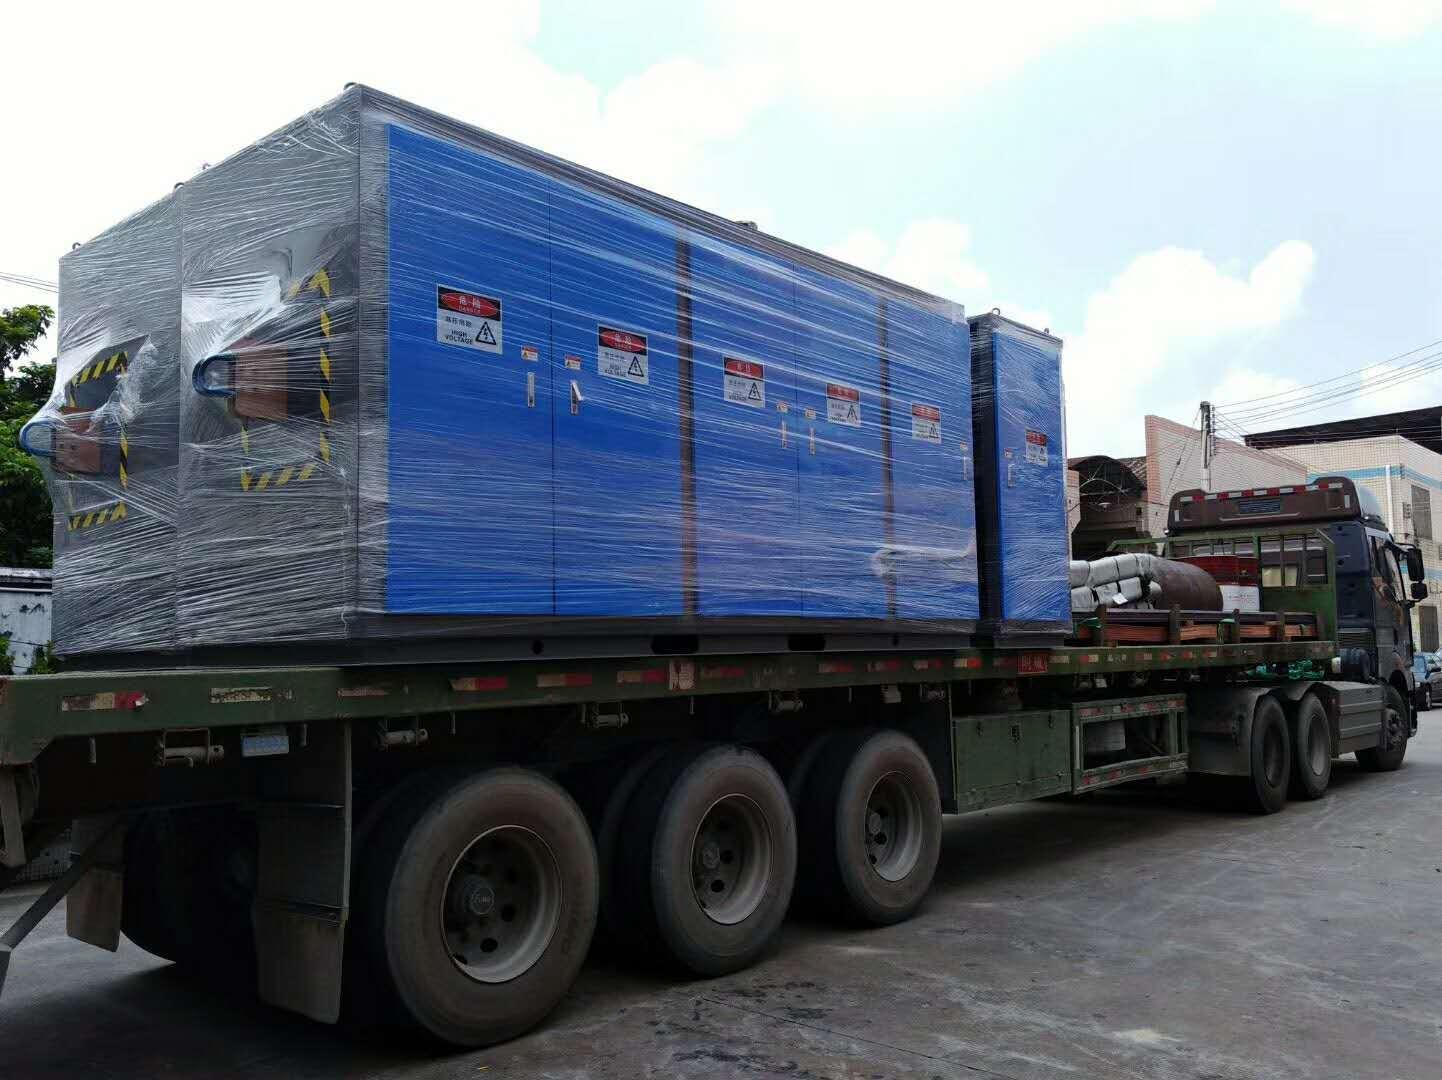 KGCL Induction Furnace for Melting Steel Scrap